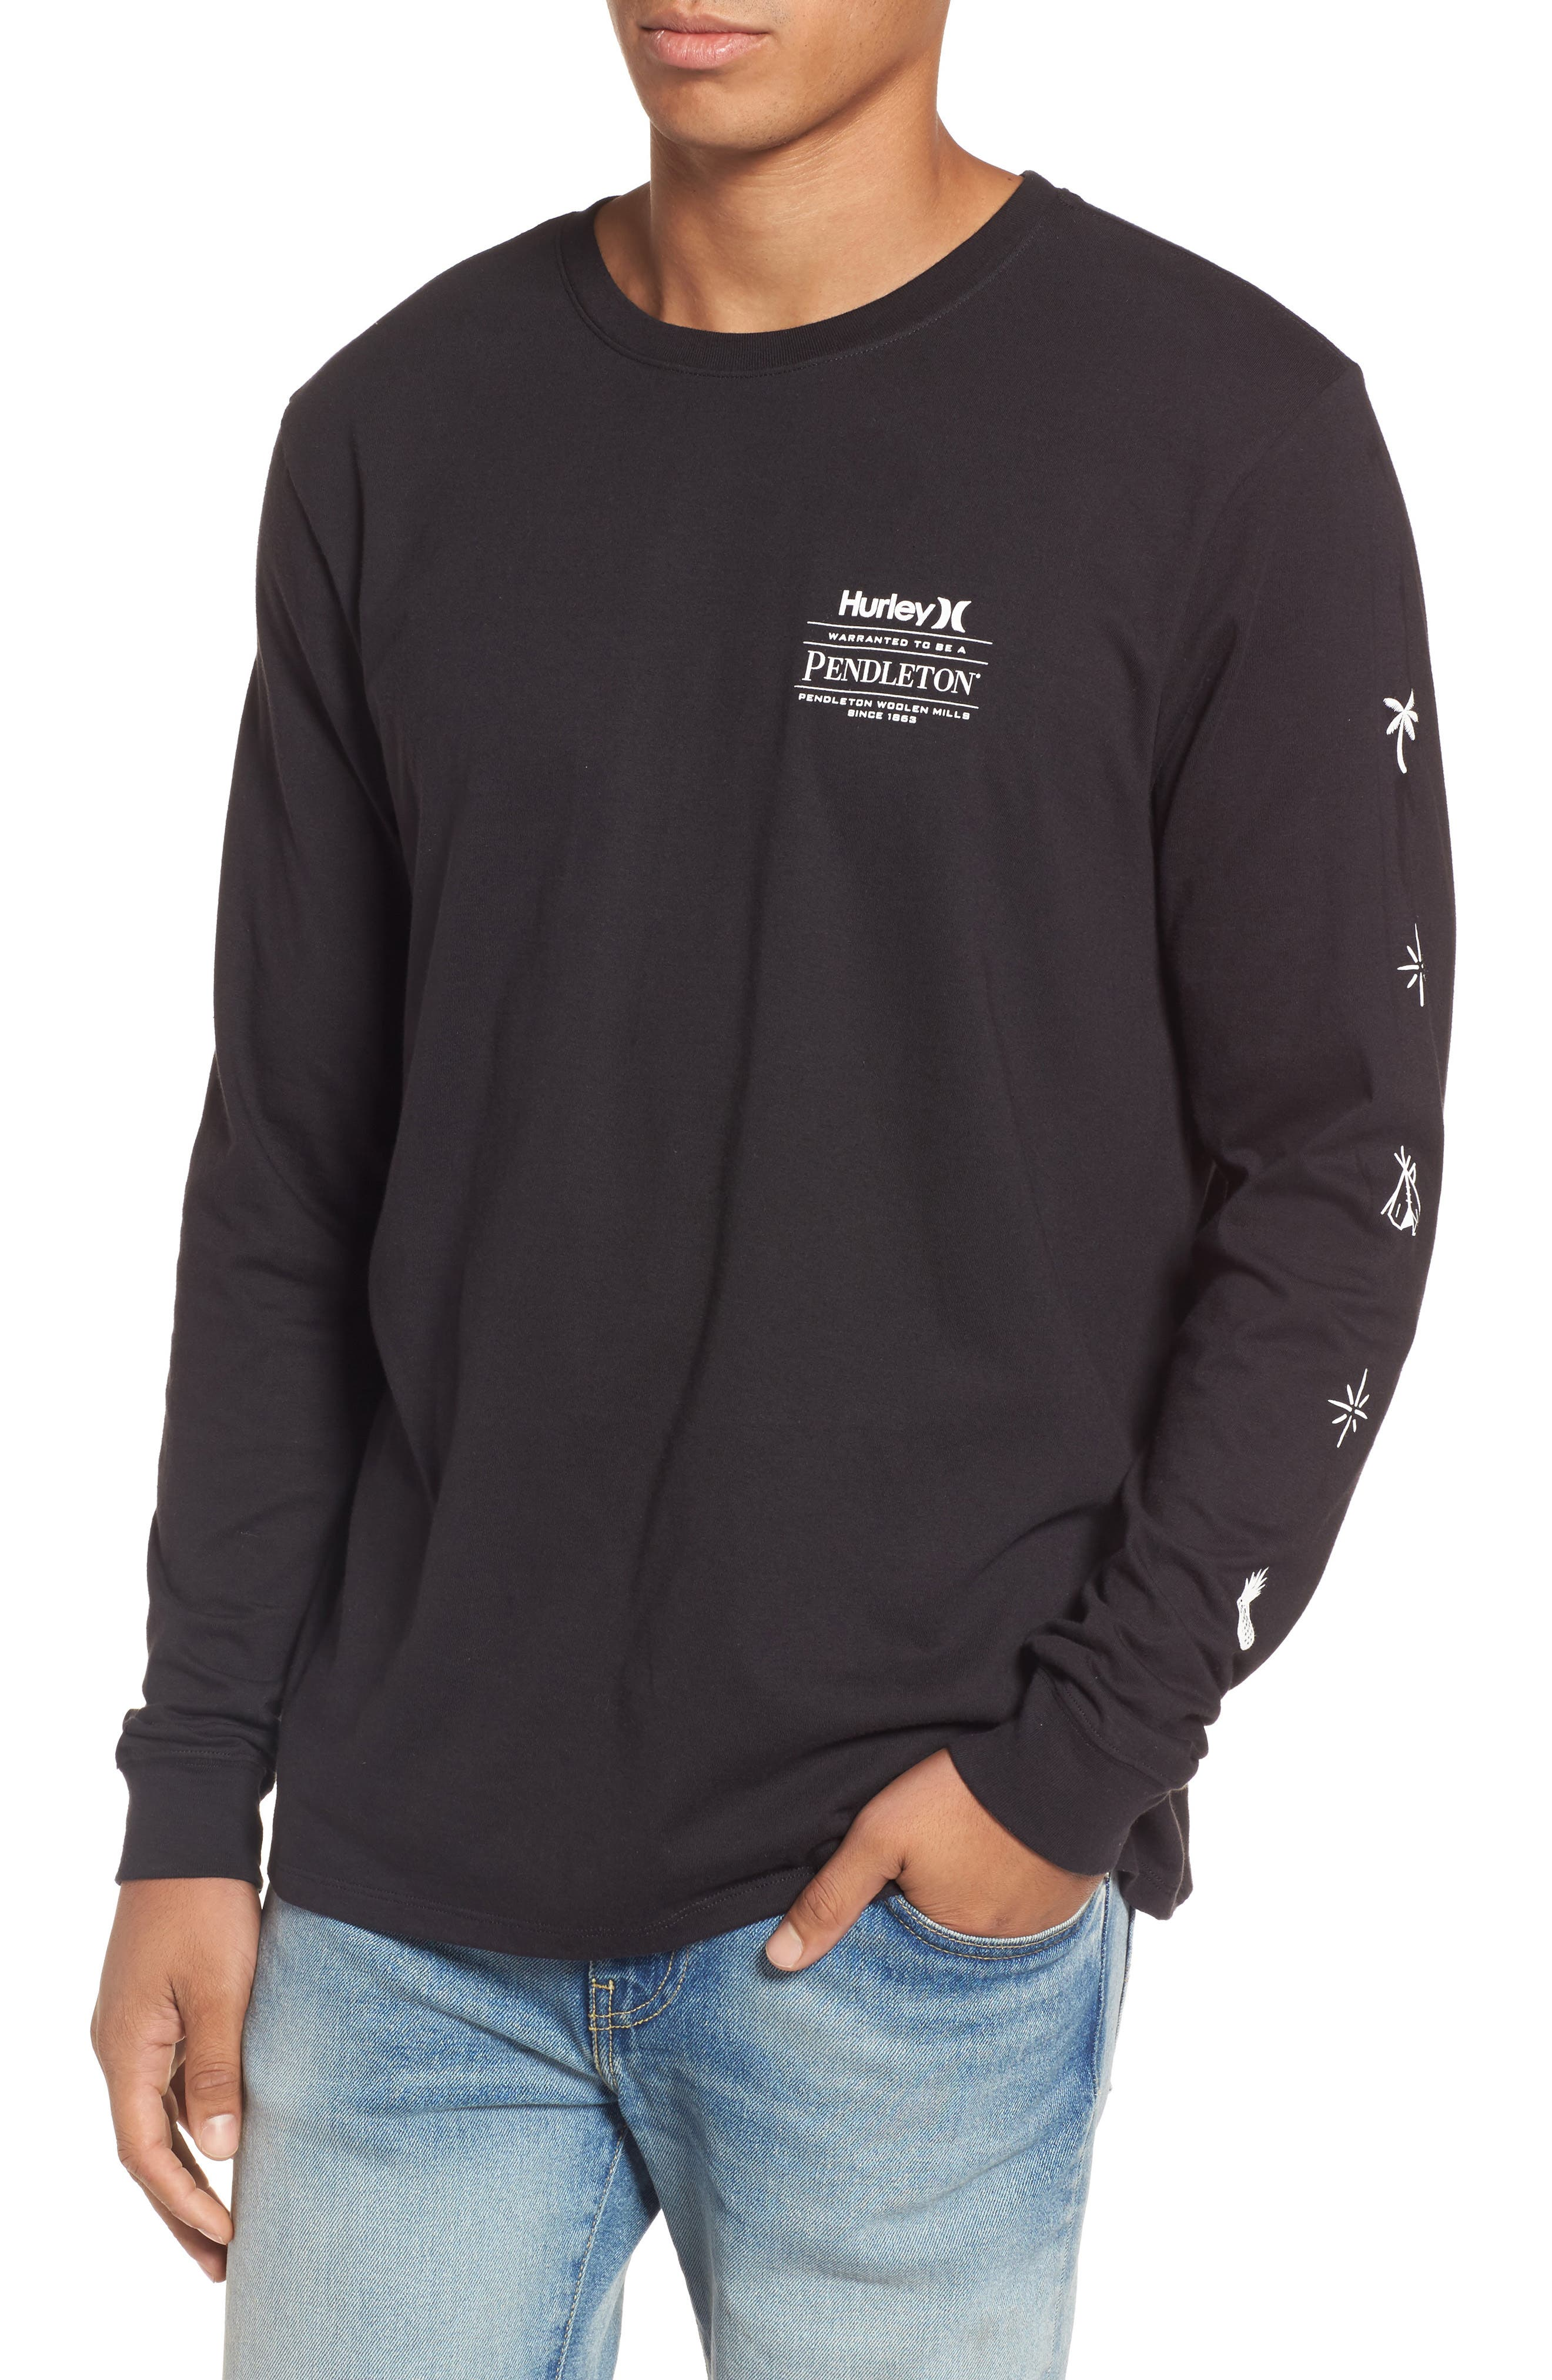 x Pendleton Long Sleeve T-Shirt,                             Main thumbnail 1, color,                             010